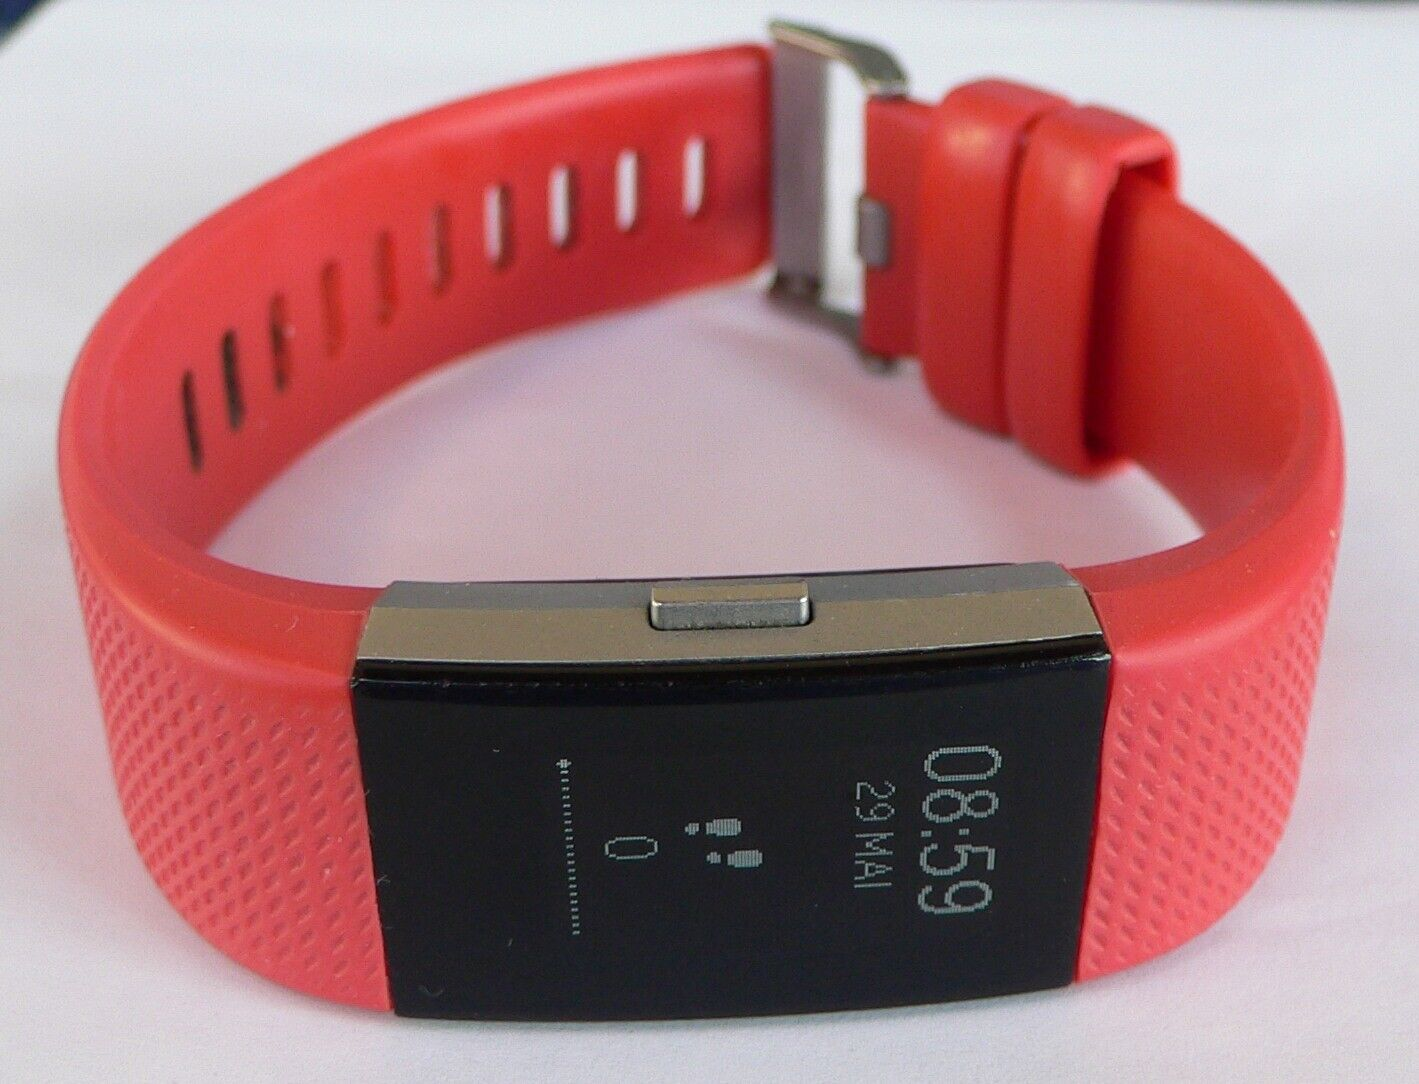 Fitbit Charge 2 Aktivitätstracker - rotes Band, wenig benutzt, funktionsfähig!